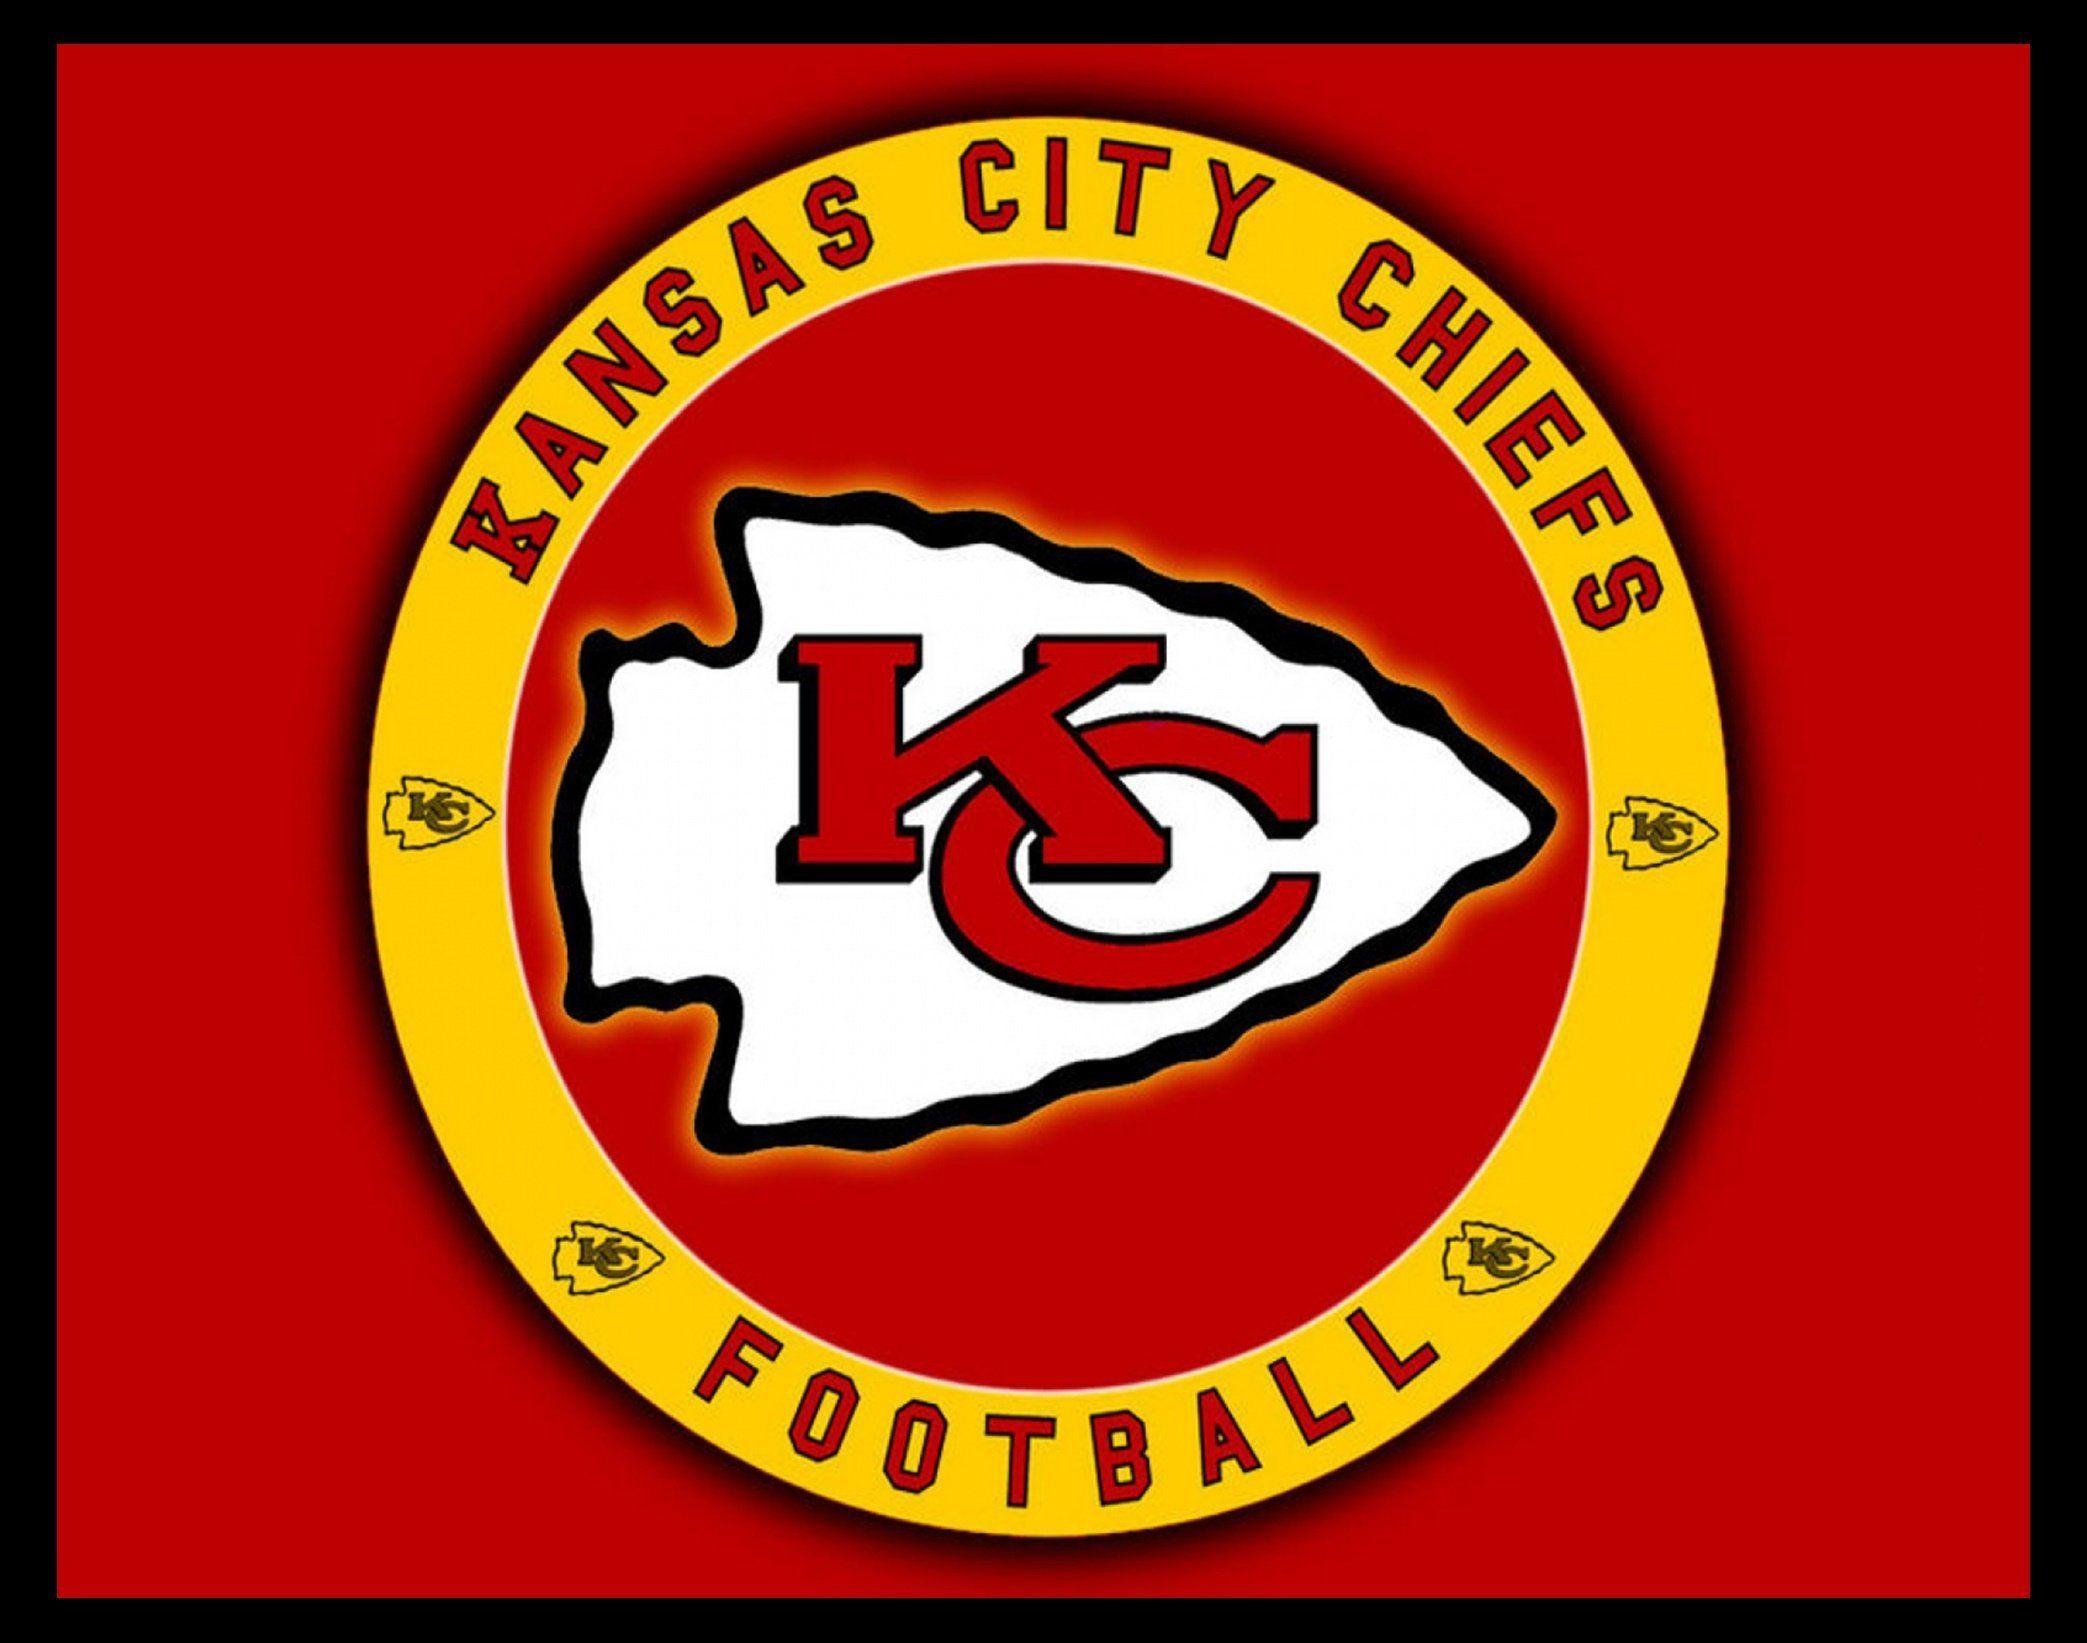 Kansas City Chiefs Arrowhead Logo Poster Gift For Men Women Game Room Wall Art Football Fan Wall Decor Office 8x10 11x14 F